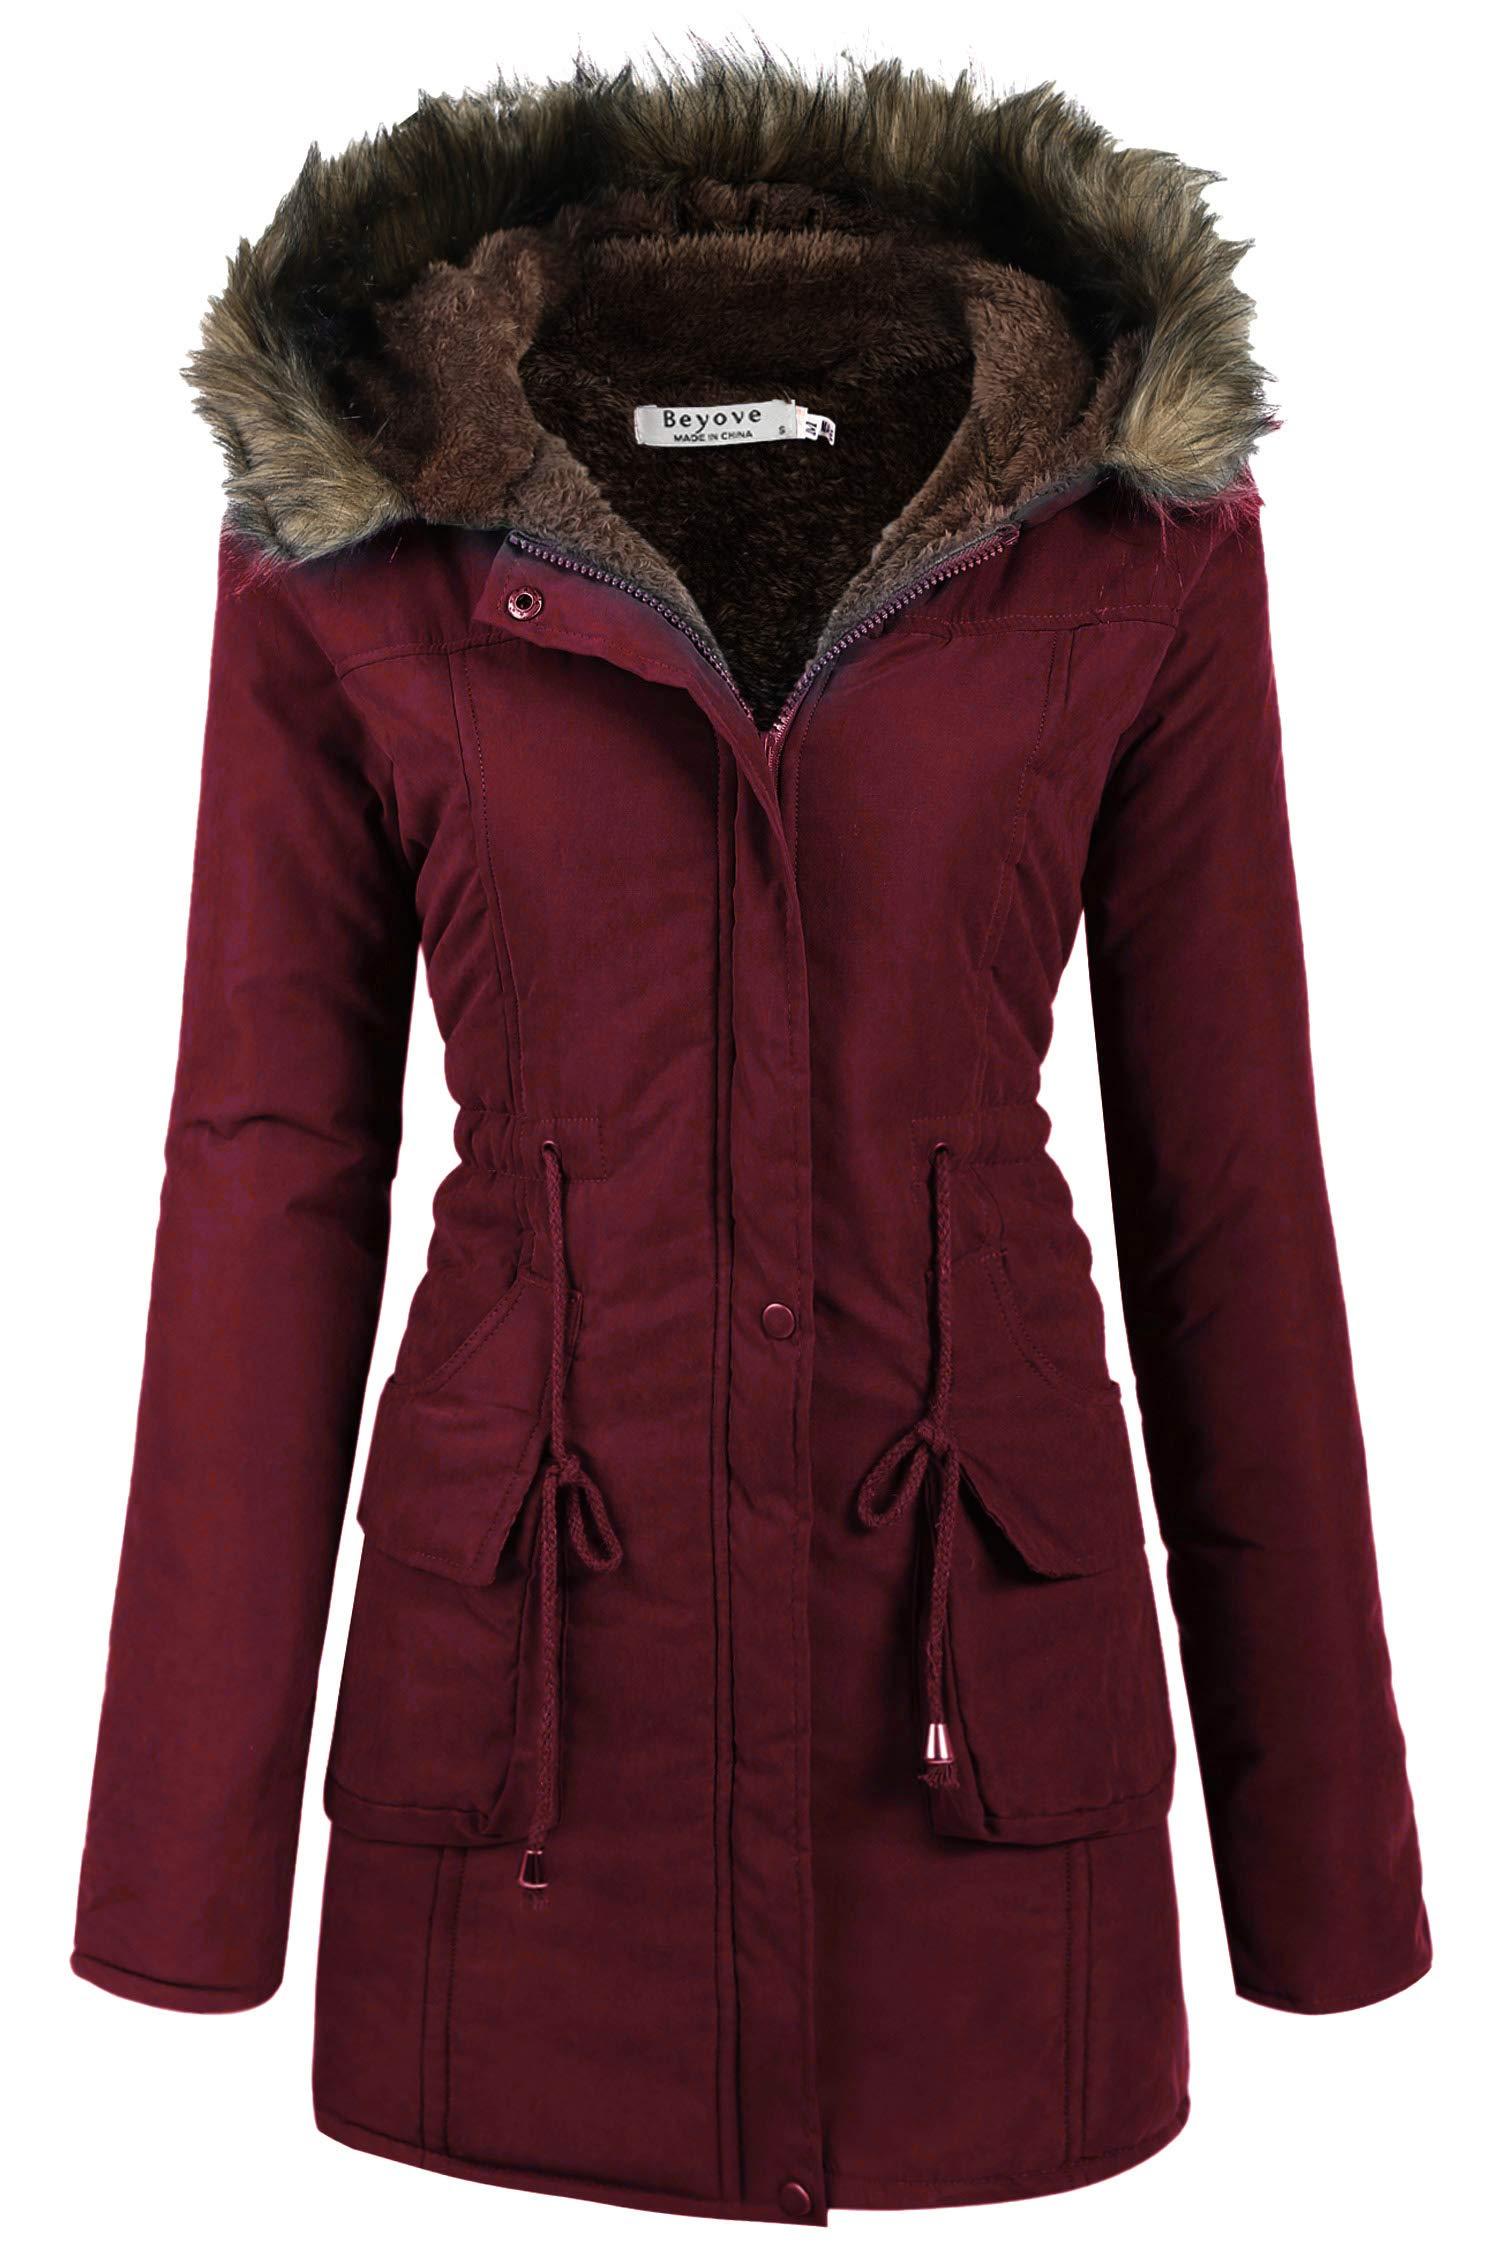 Beyove Womens Military Hooded Warm Winter Parka Coats Outerwear Jacket by Beyove